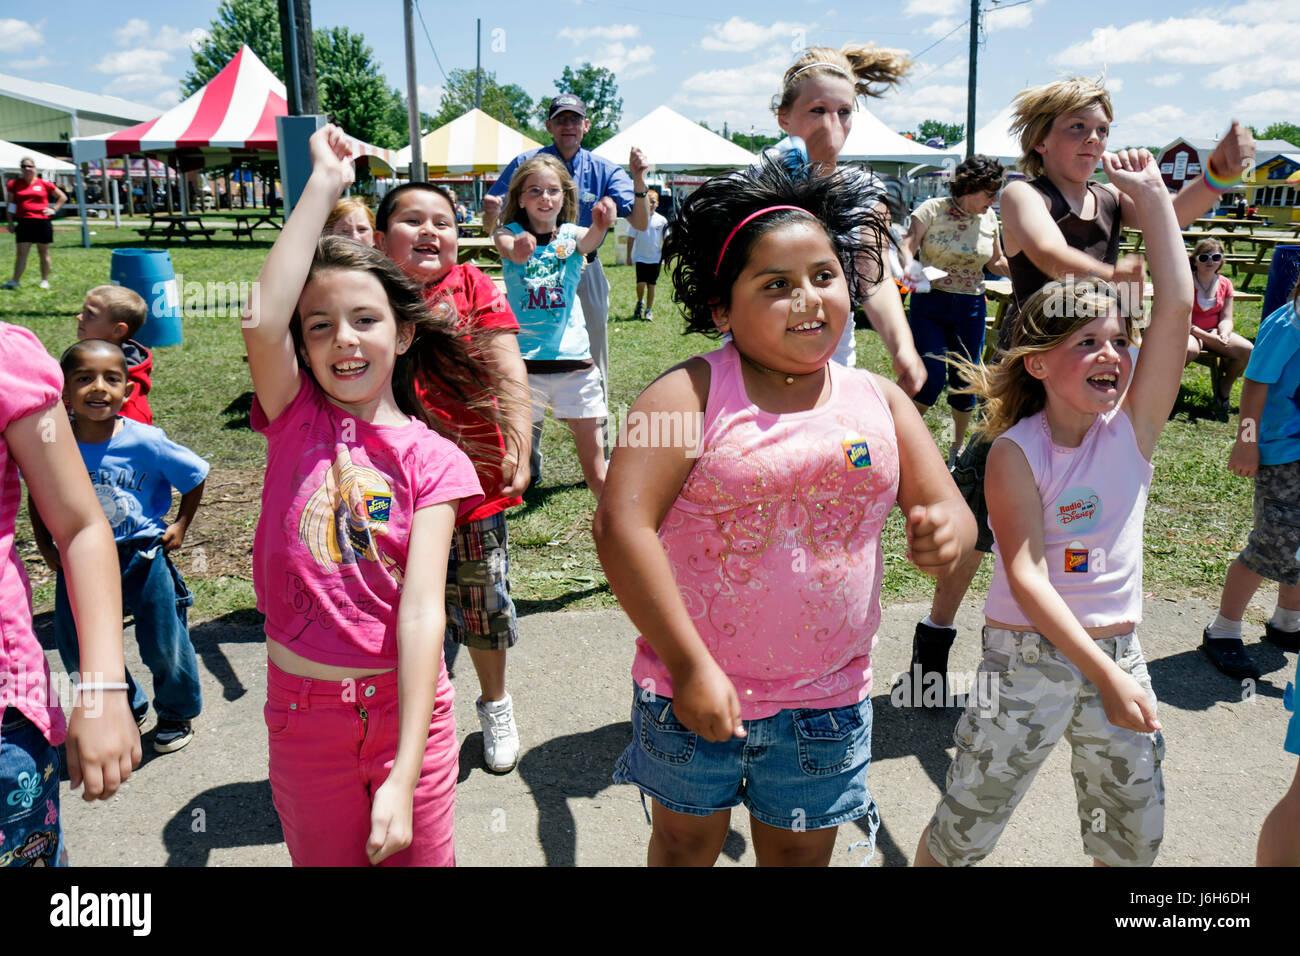 Wisconsin Kenosha Kenosha County Fairgrounds The Ultimate Kid Fest family event Hispanic girl boy childhood fun - Stock Image